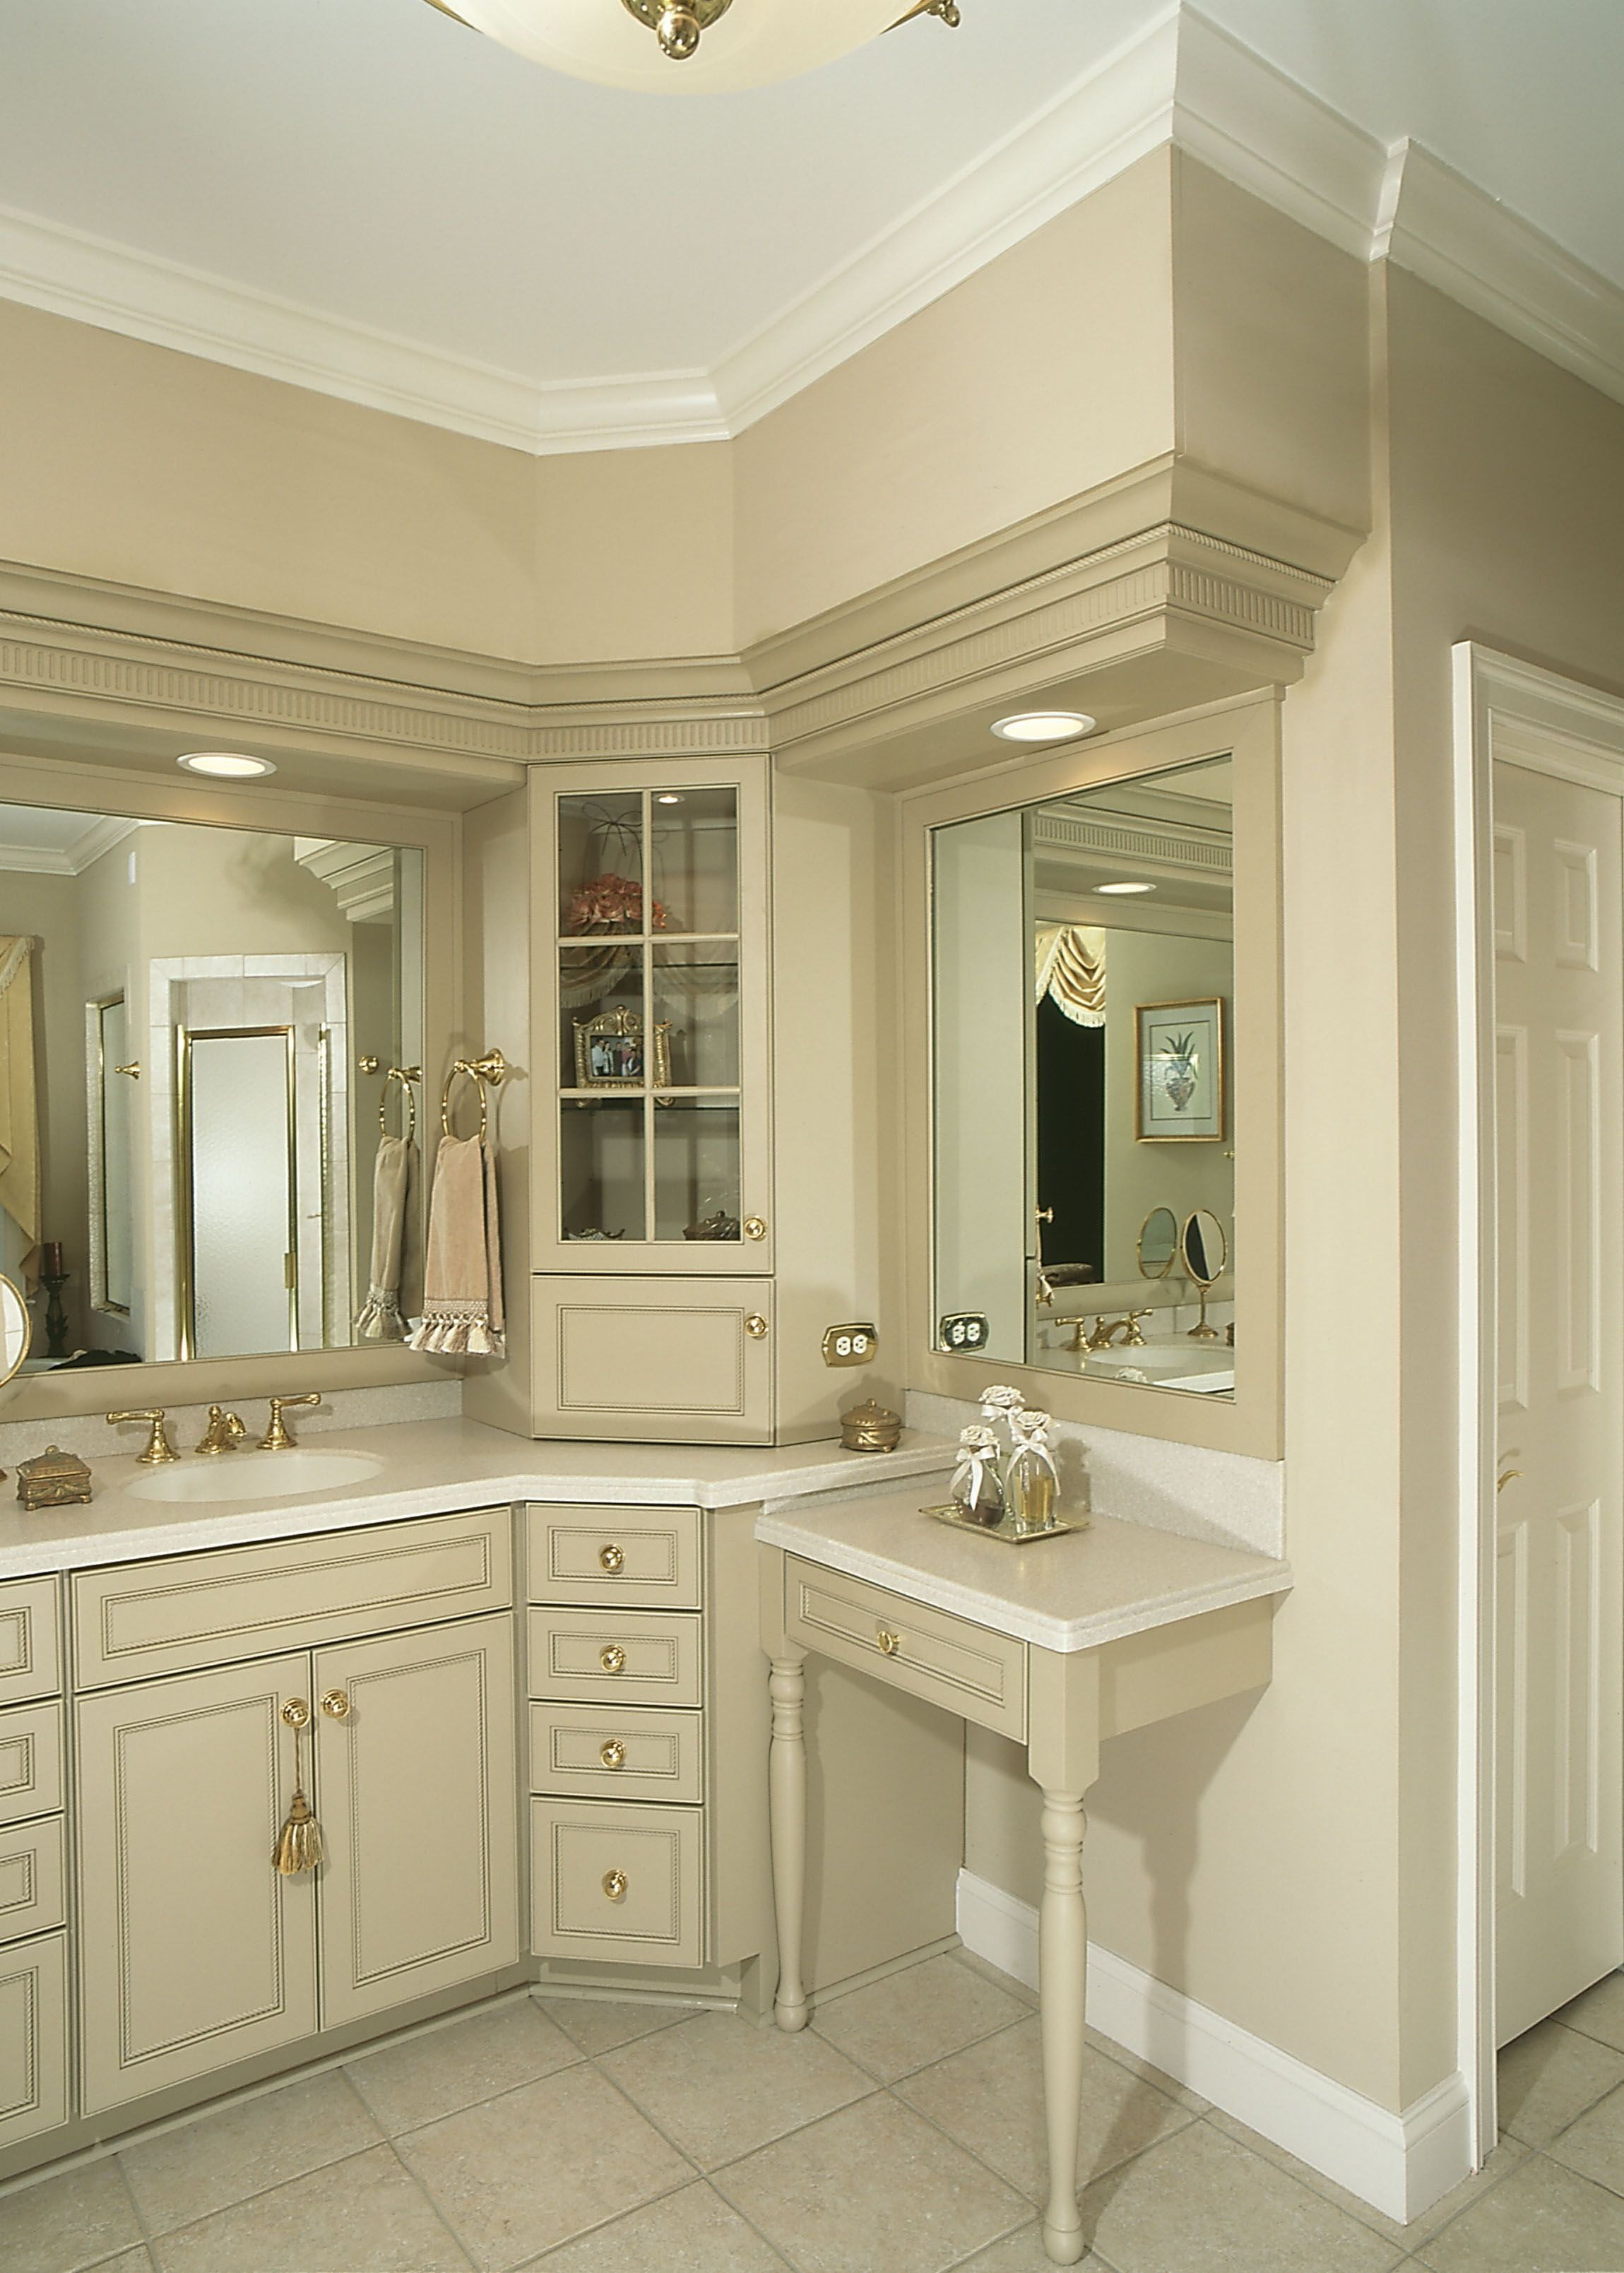 Custom Wood Products Bathroom Cabinets Corner Cabinet And Vanity